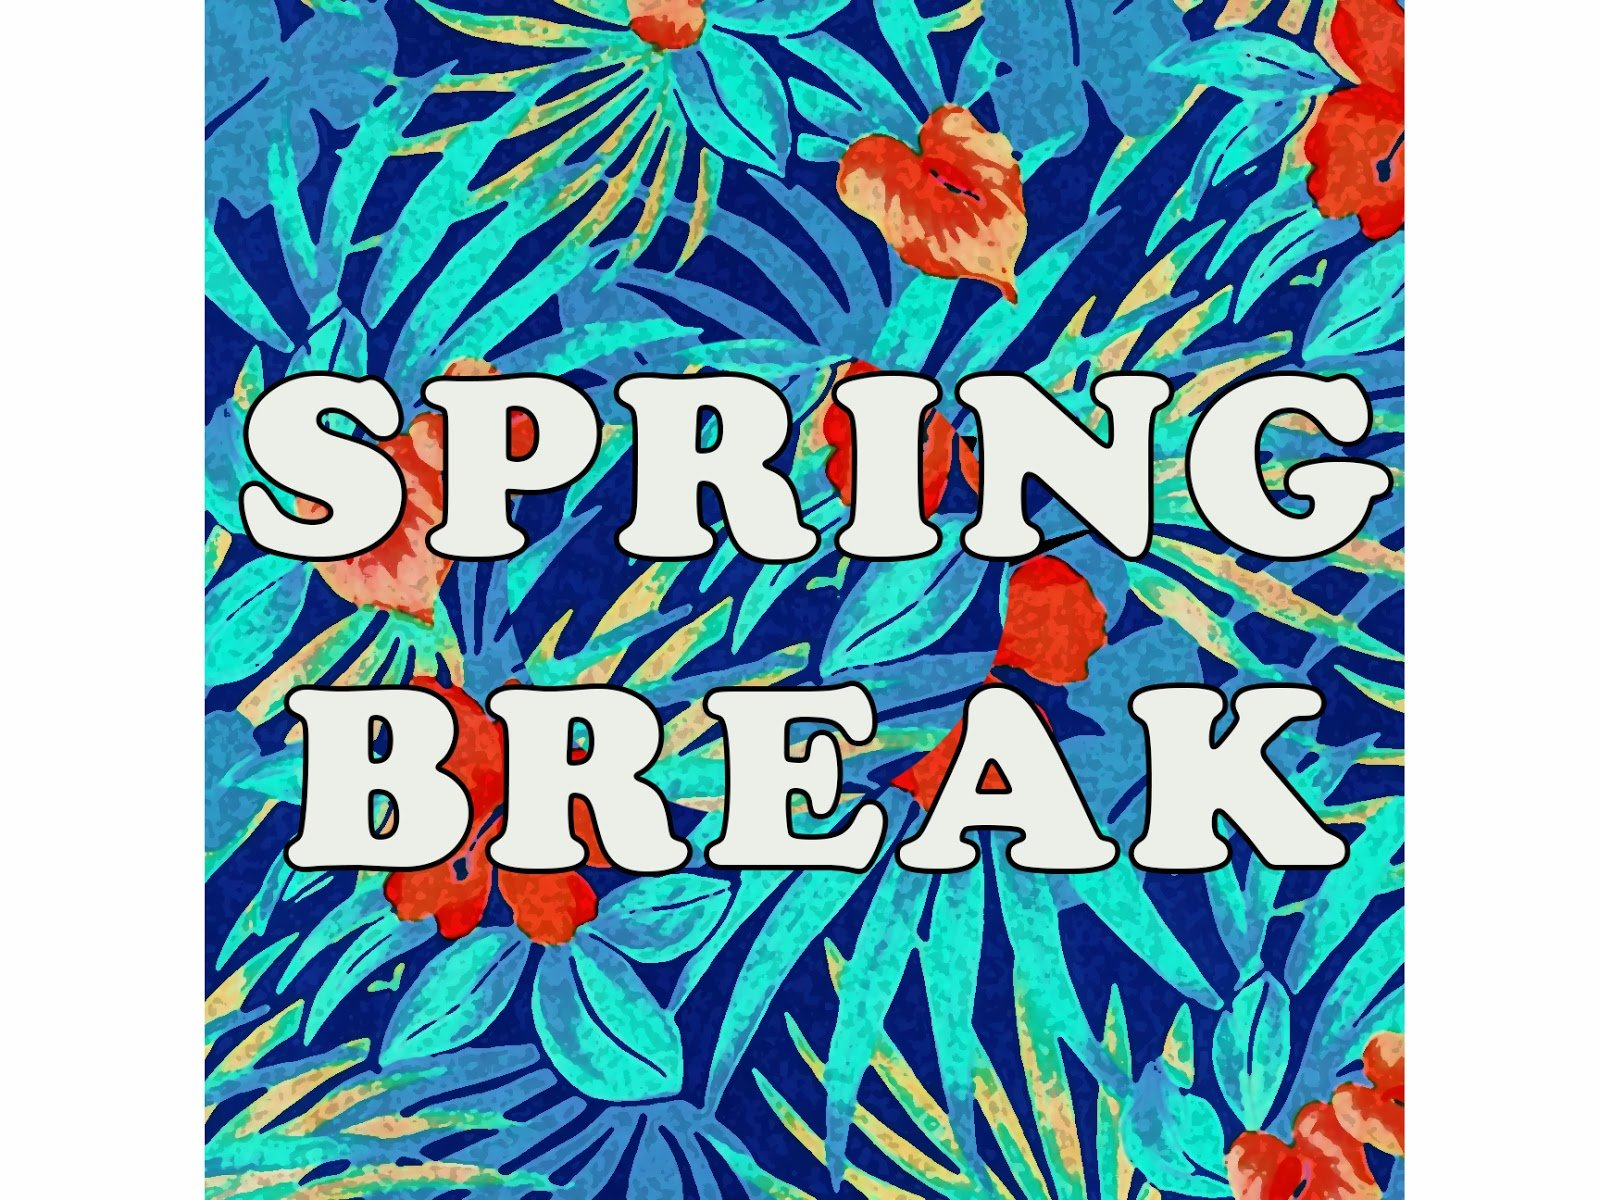 Spring Break 2014 Wallpaper Budget spring break 1600x1200